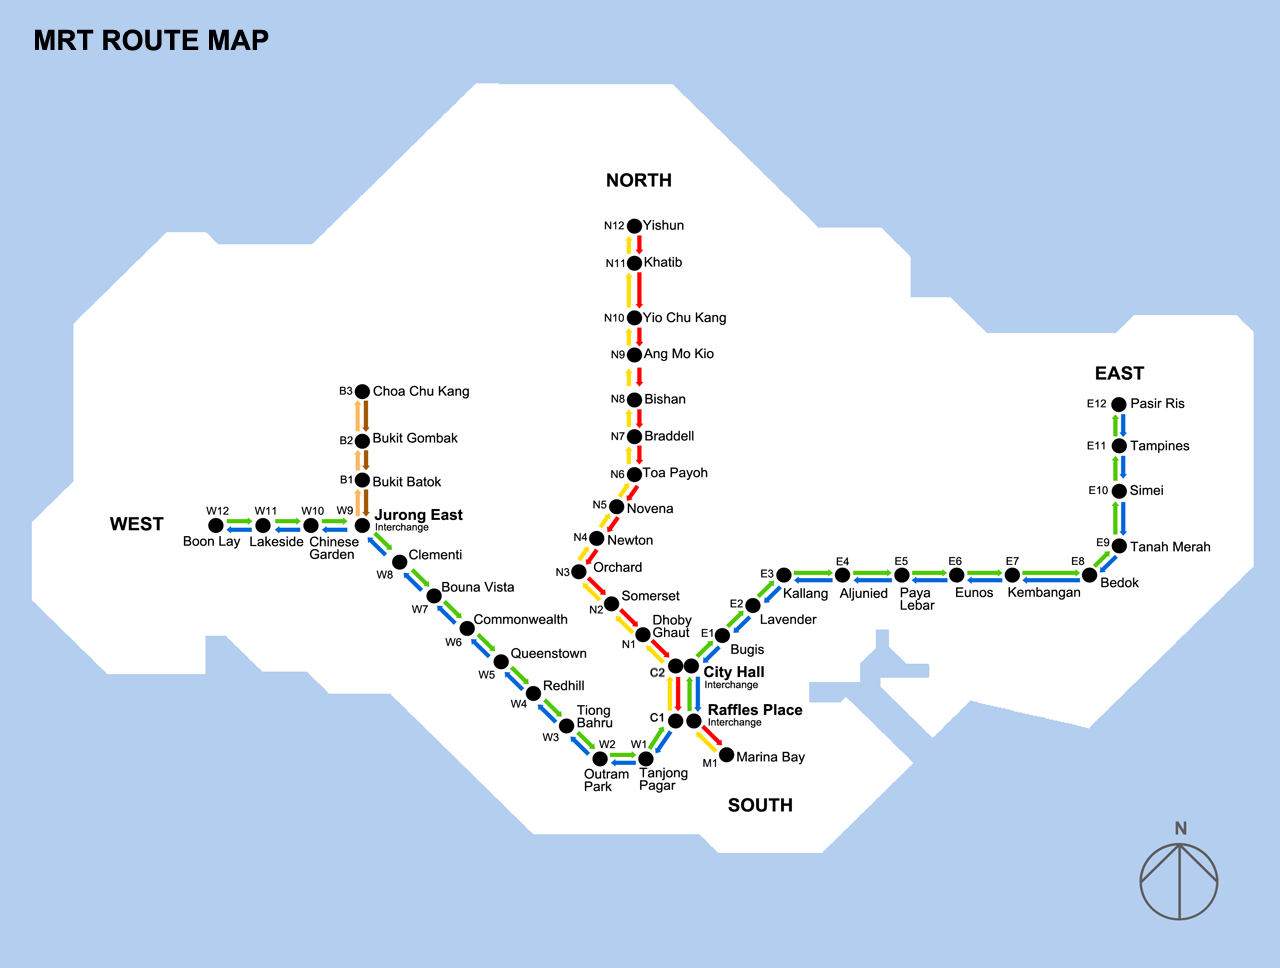 MRT map Singapore 2021